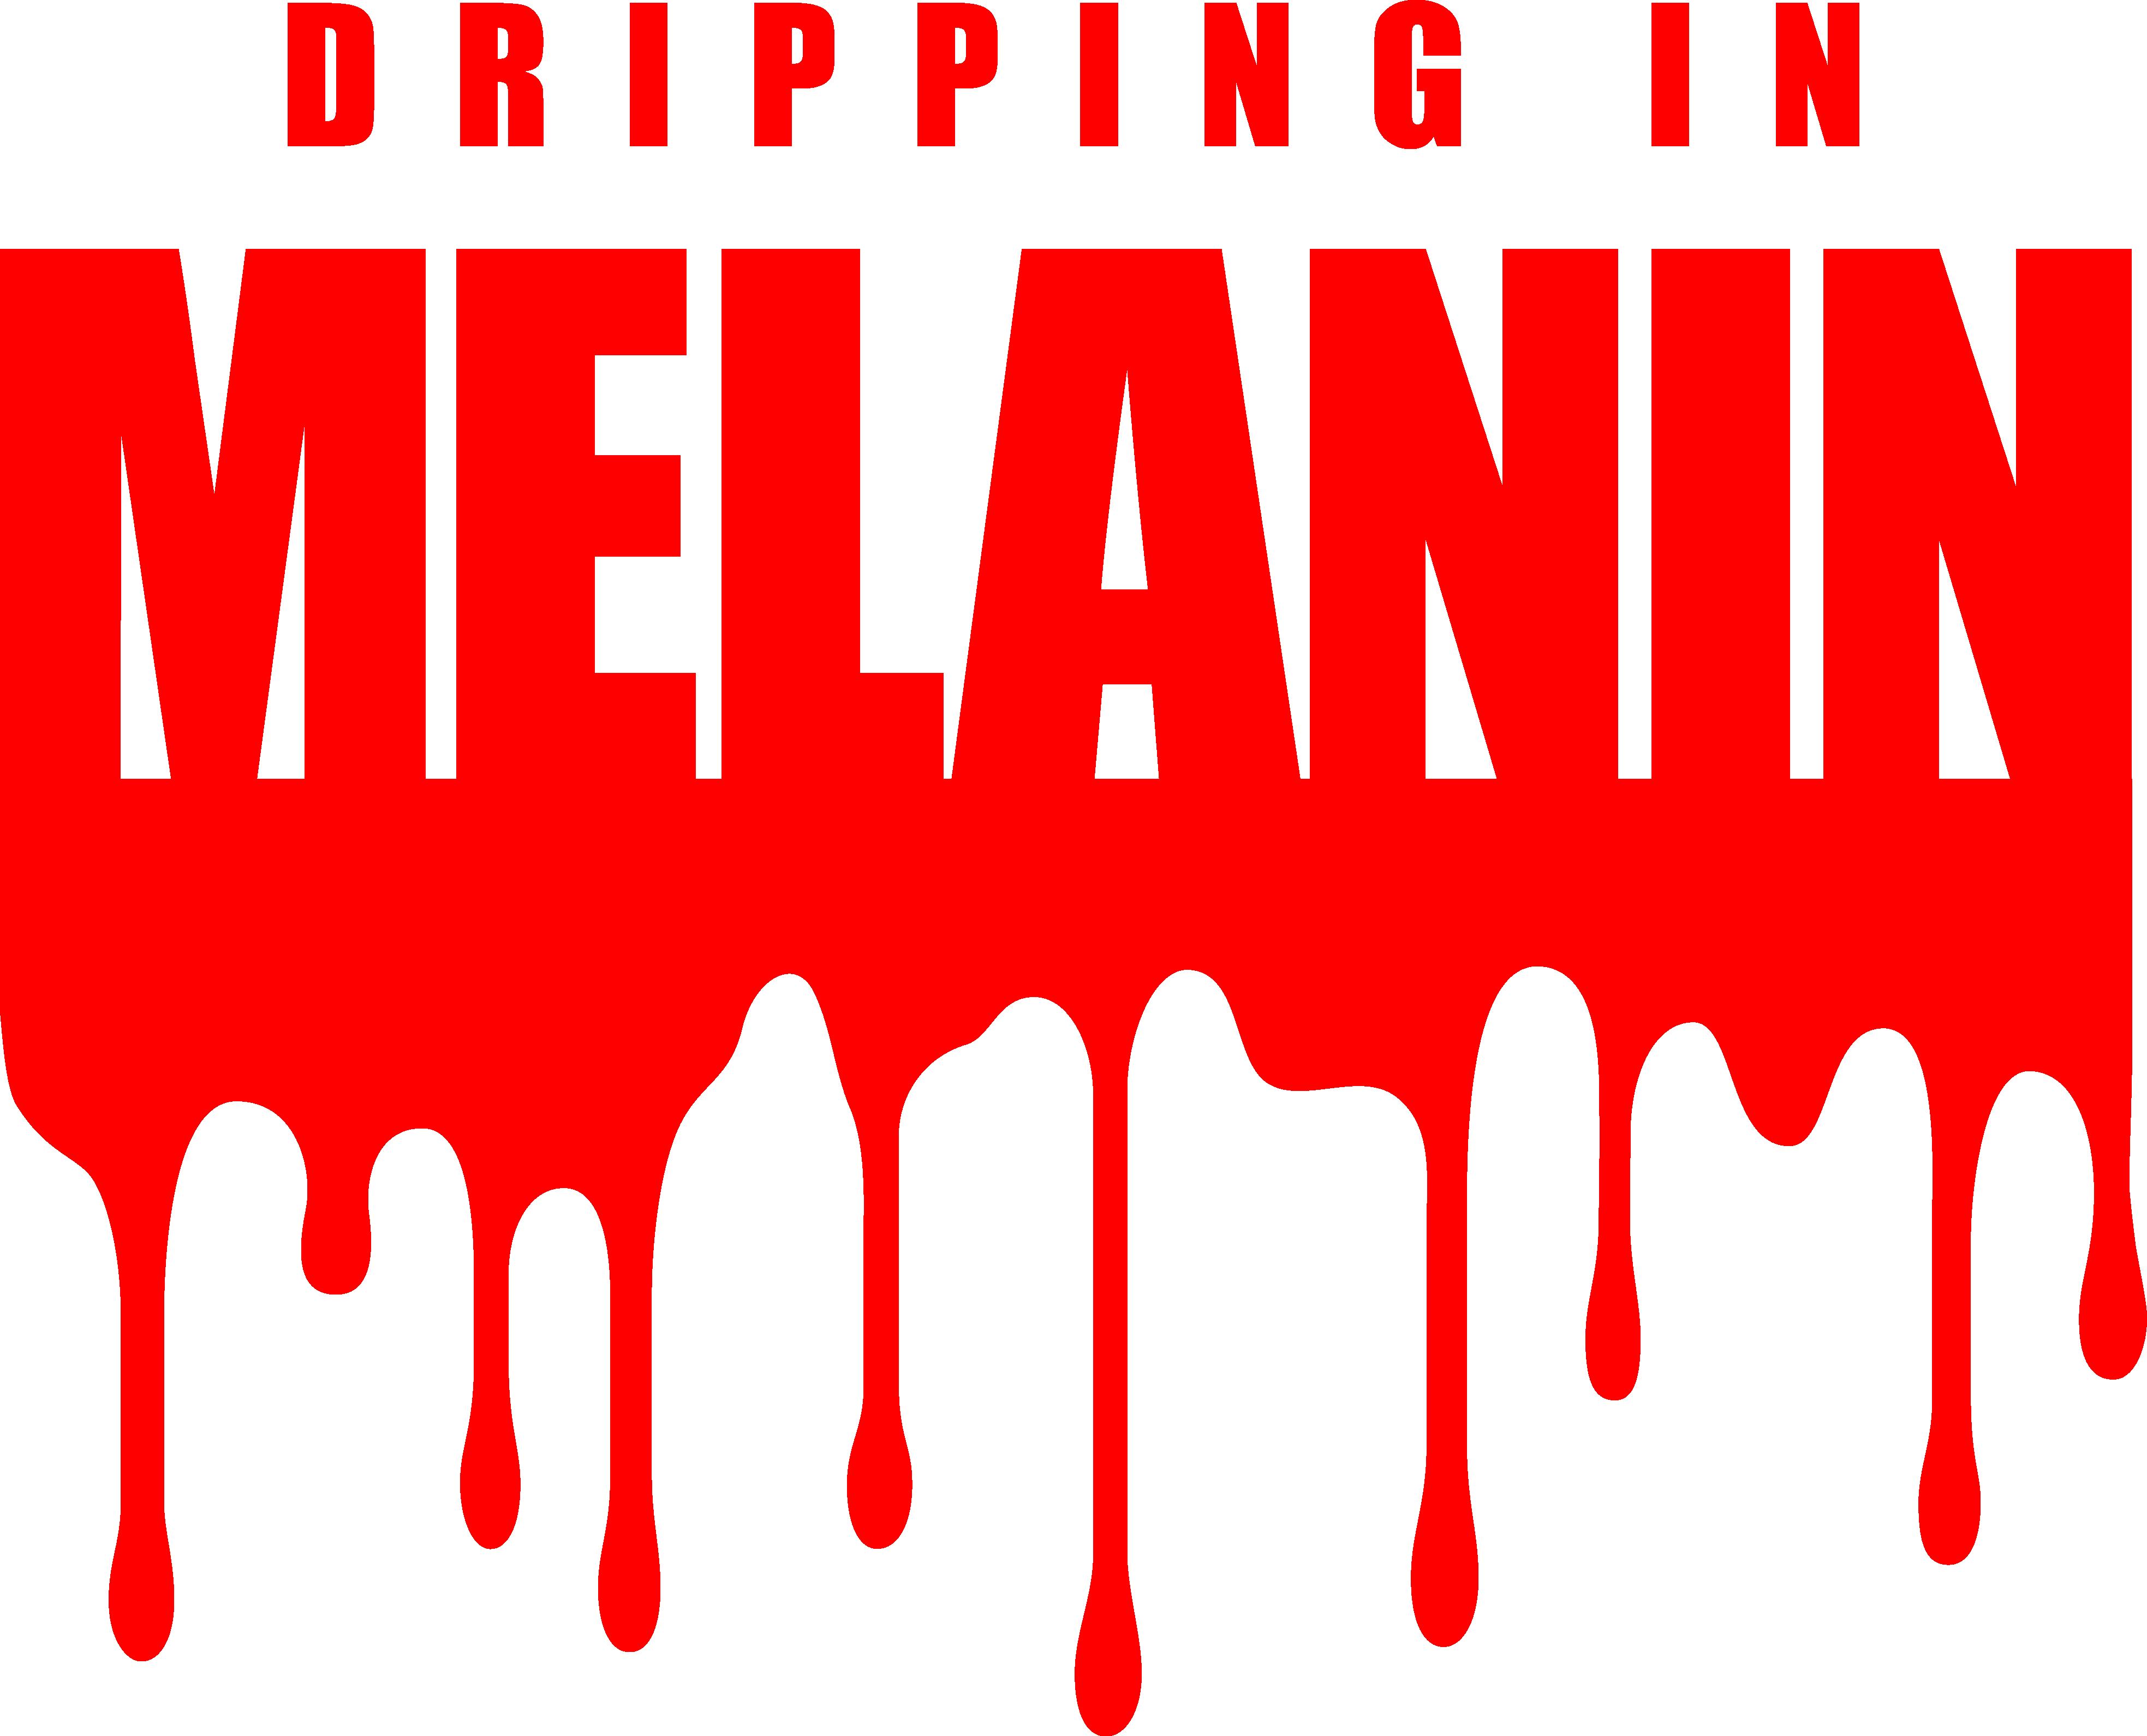 Dripping in melanin